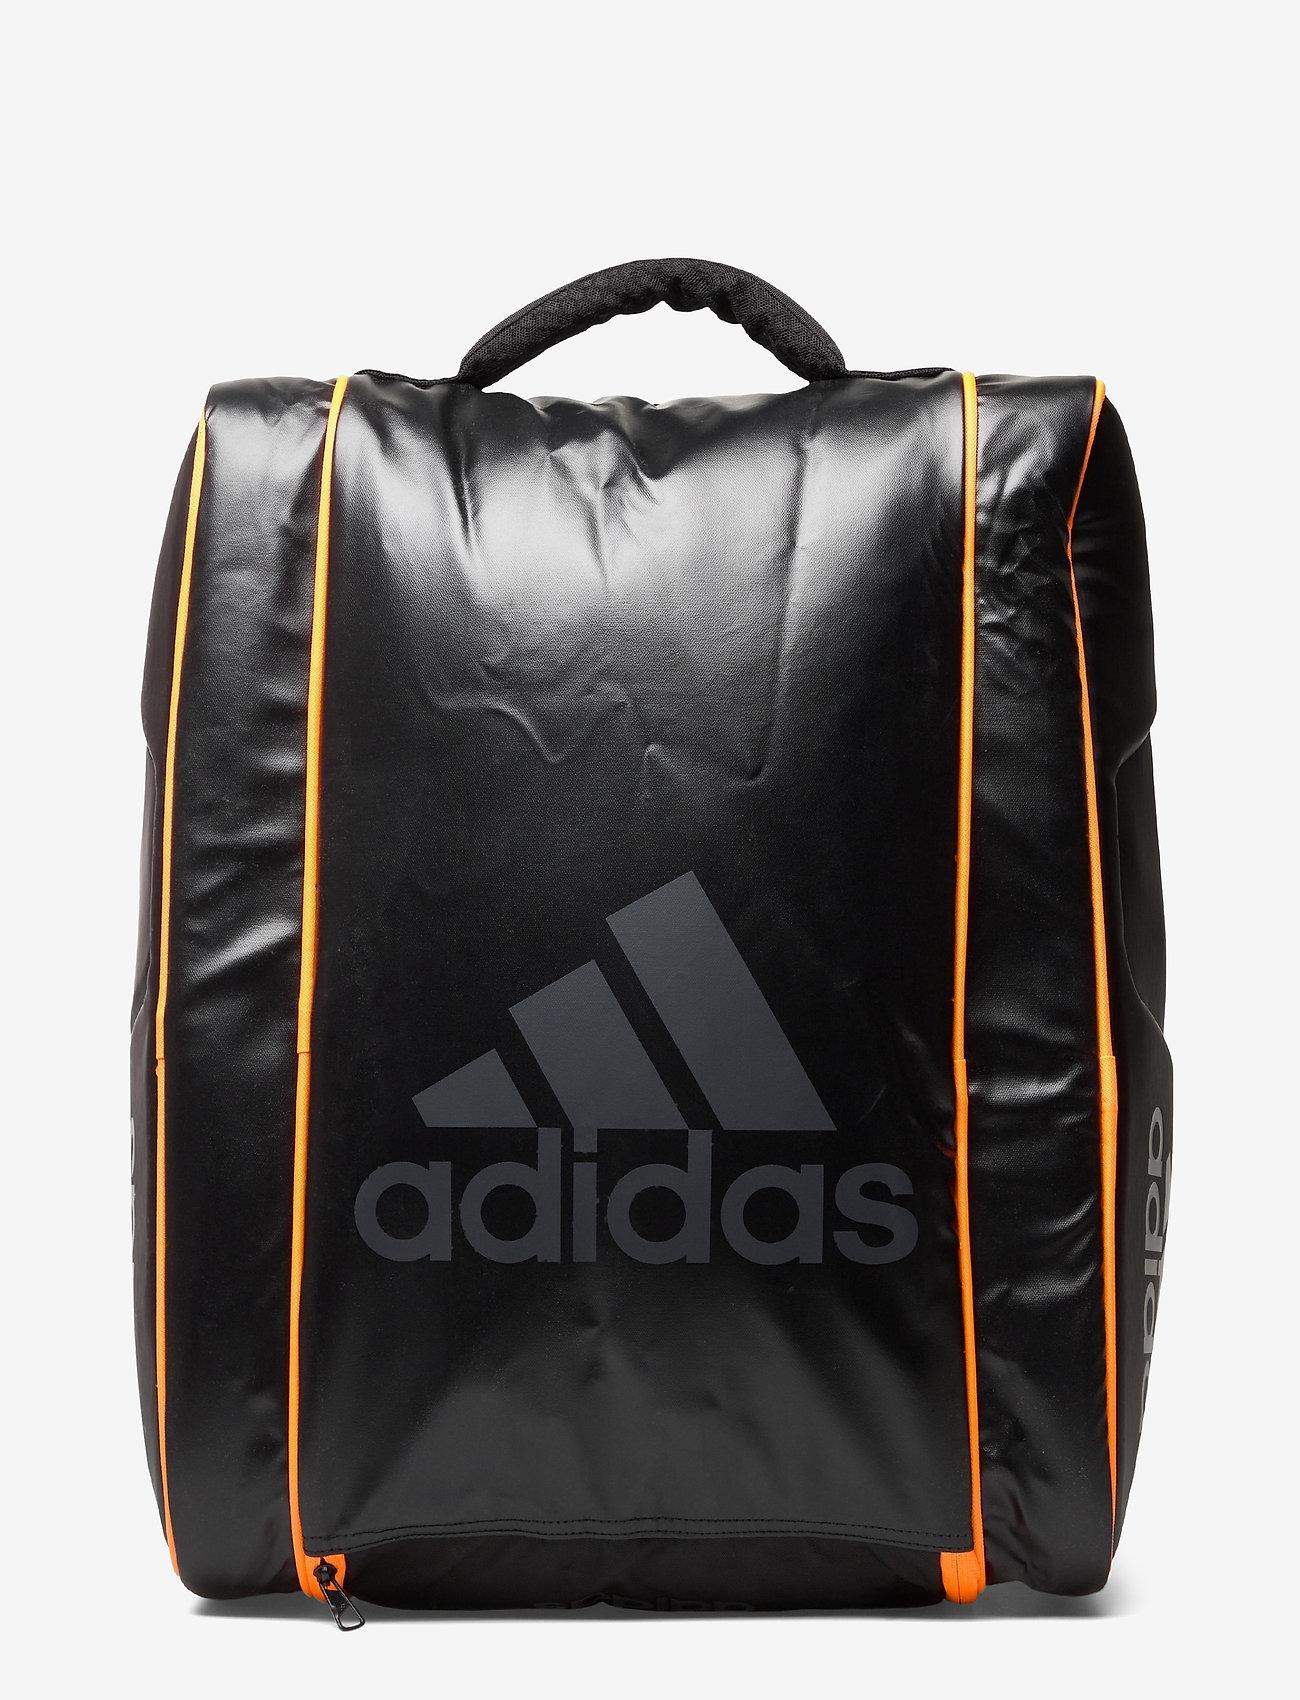 adidas Performance - Racket Bag PROTOUR - racketsporttassen - orange - 0